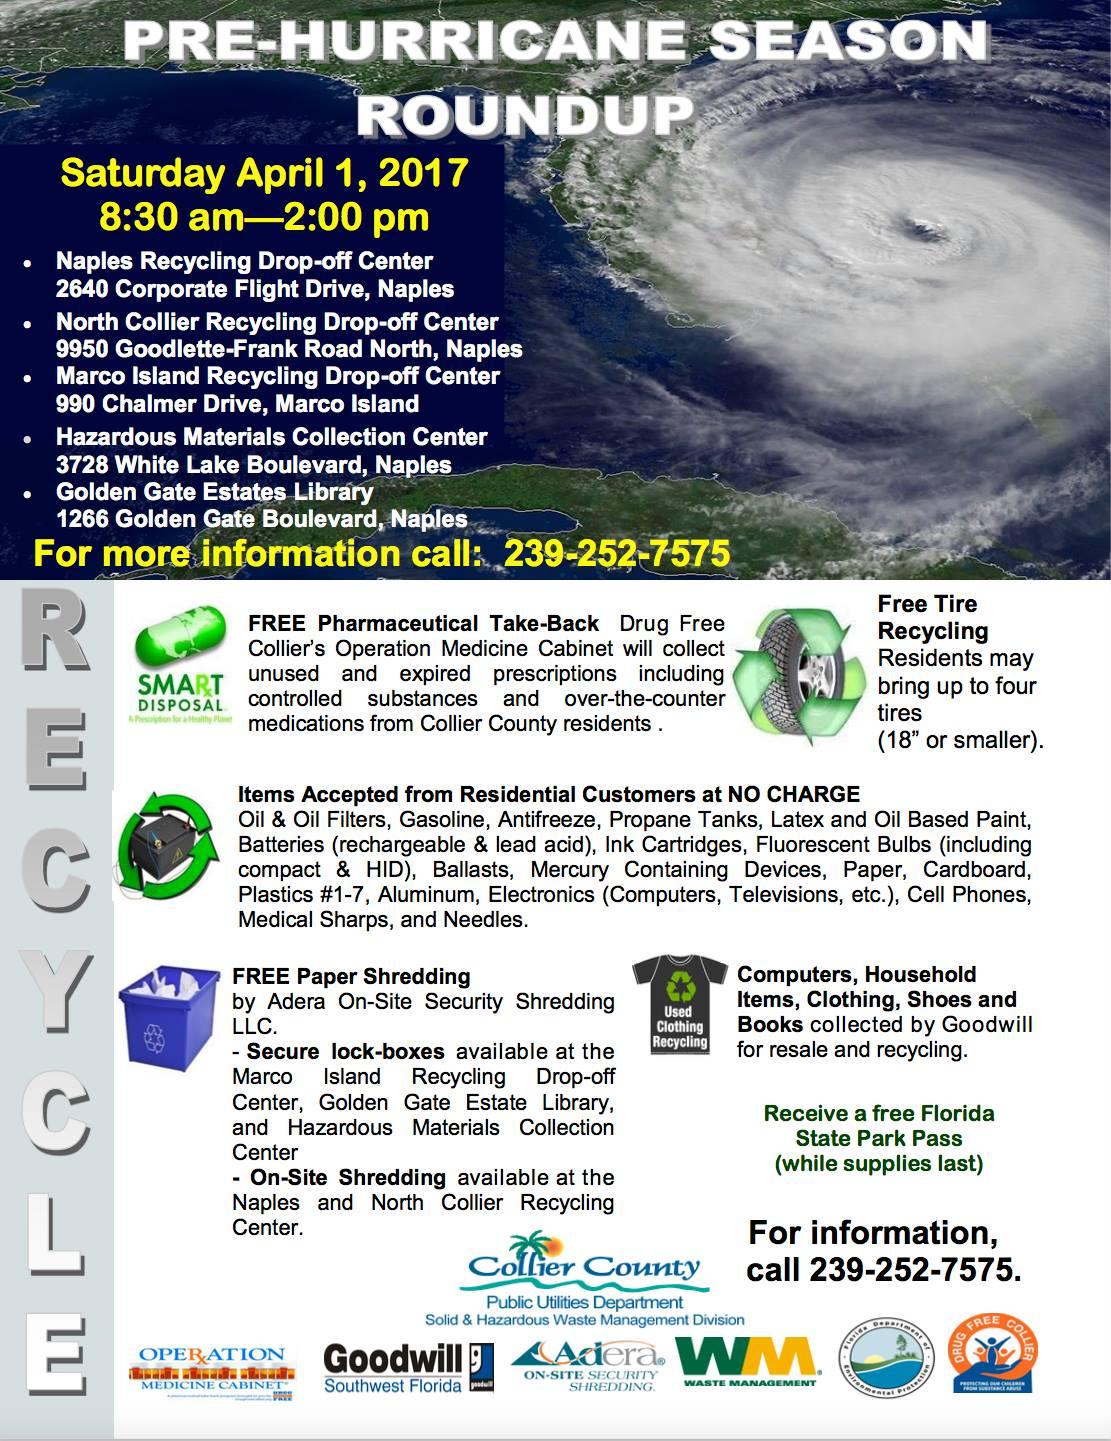 pre-hurricane season roundup flyer.jpg